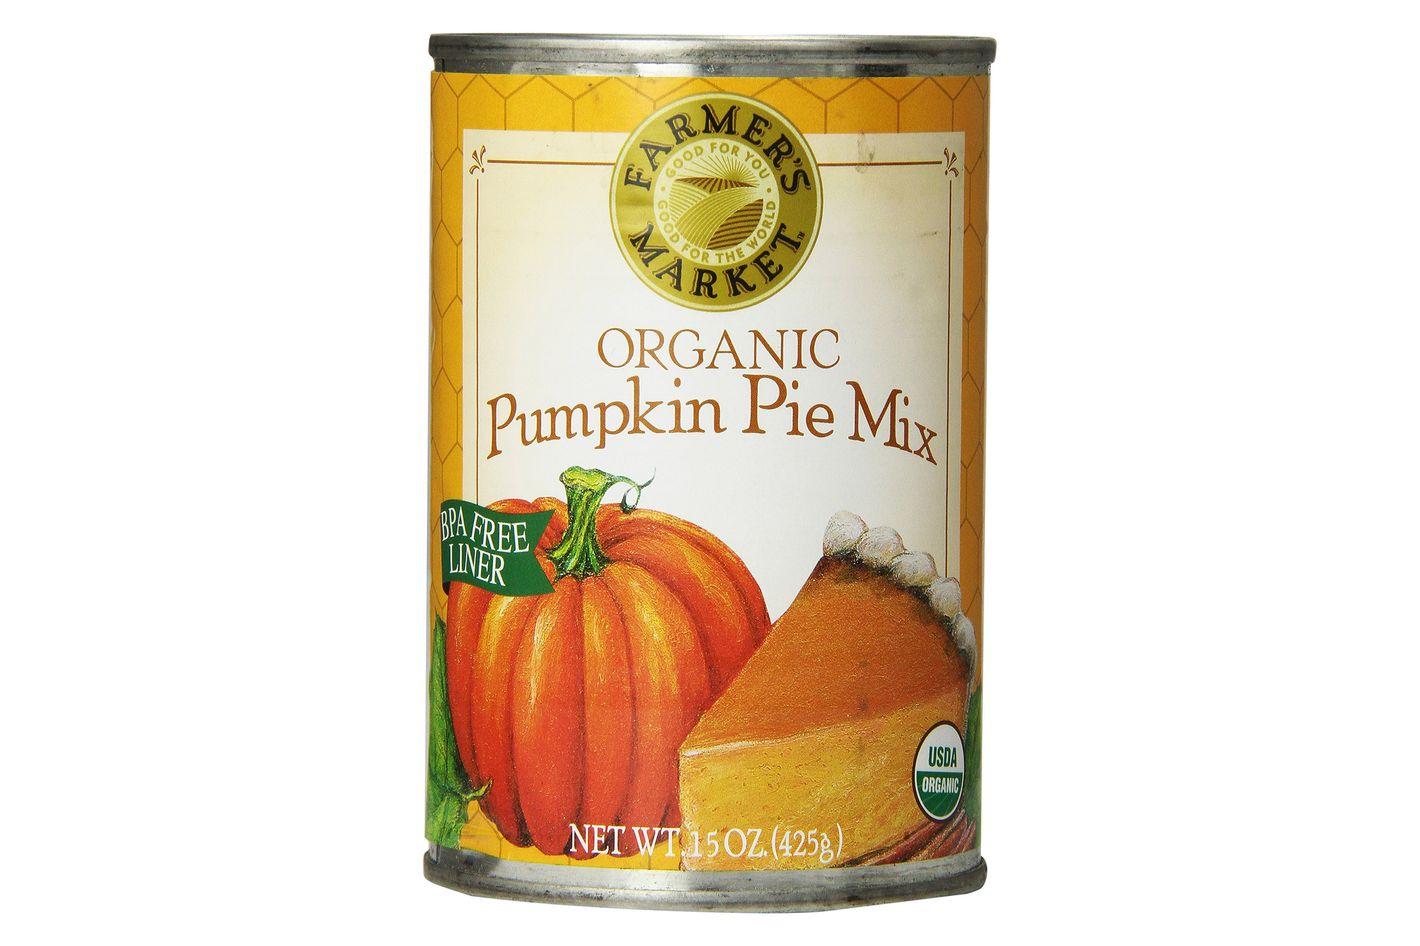 Farmer's Market Foods, Organic Canned Pumpkin Pie Mix